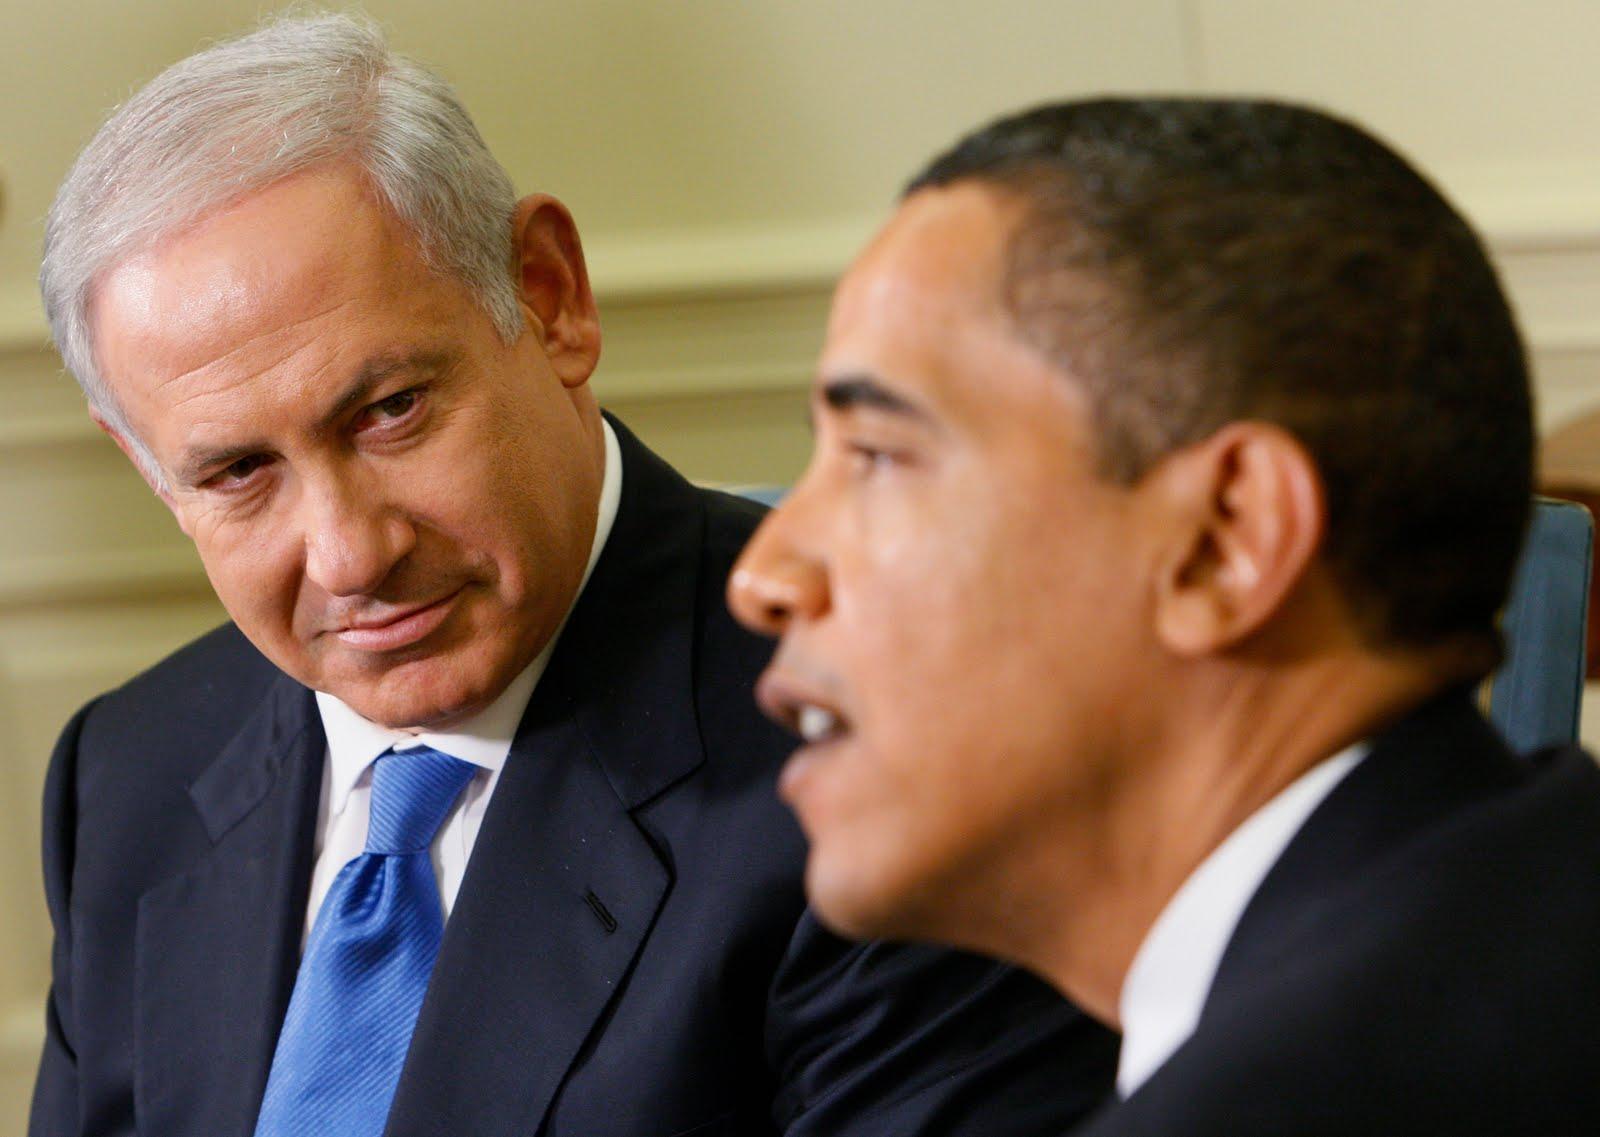 https://i2.wp.com/www.algemeiner.com/wp-content/uploads/2011/08/obama-netanyahu-2.jpg